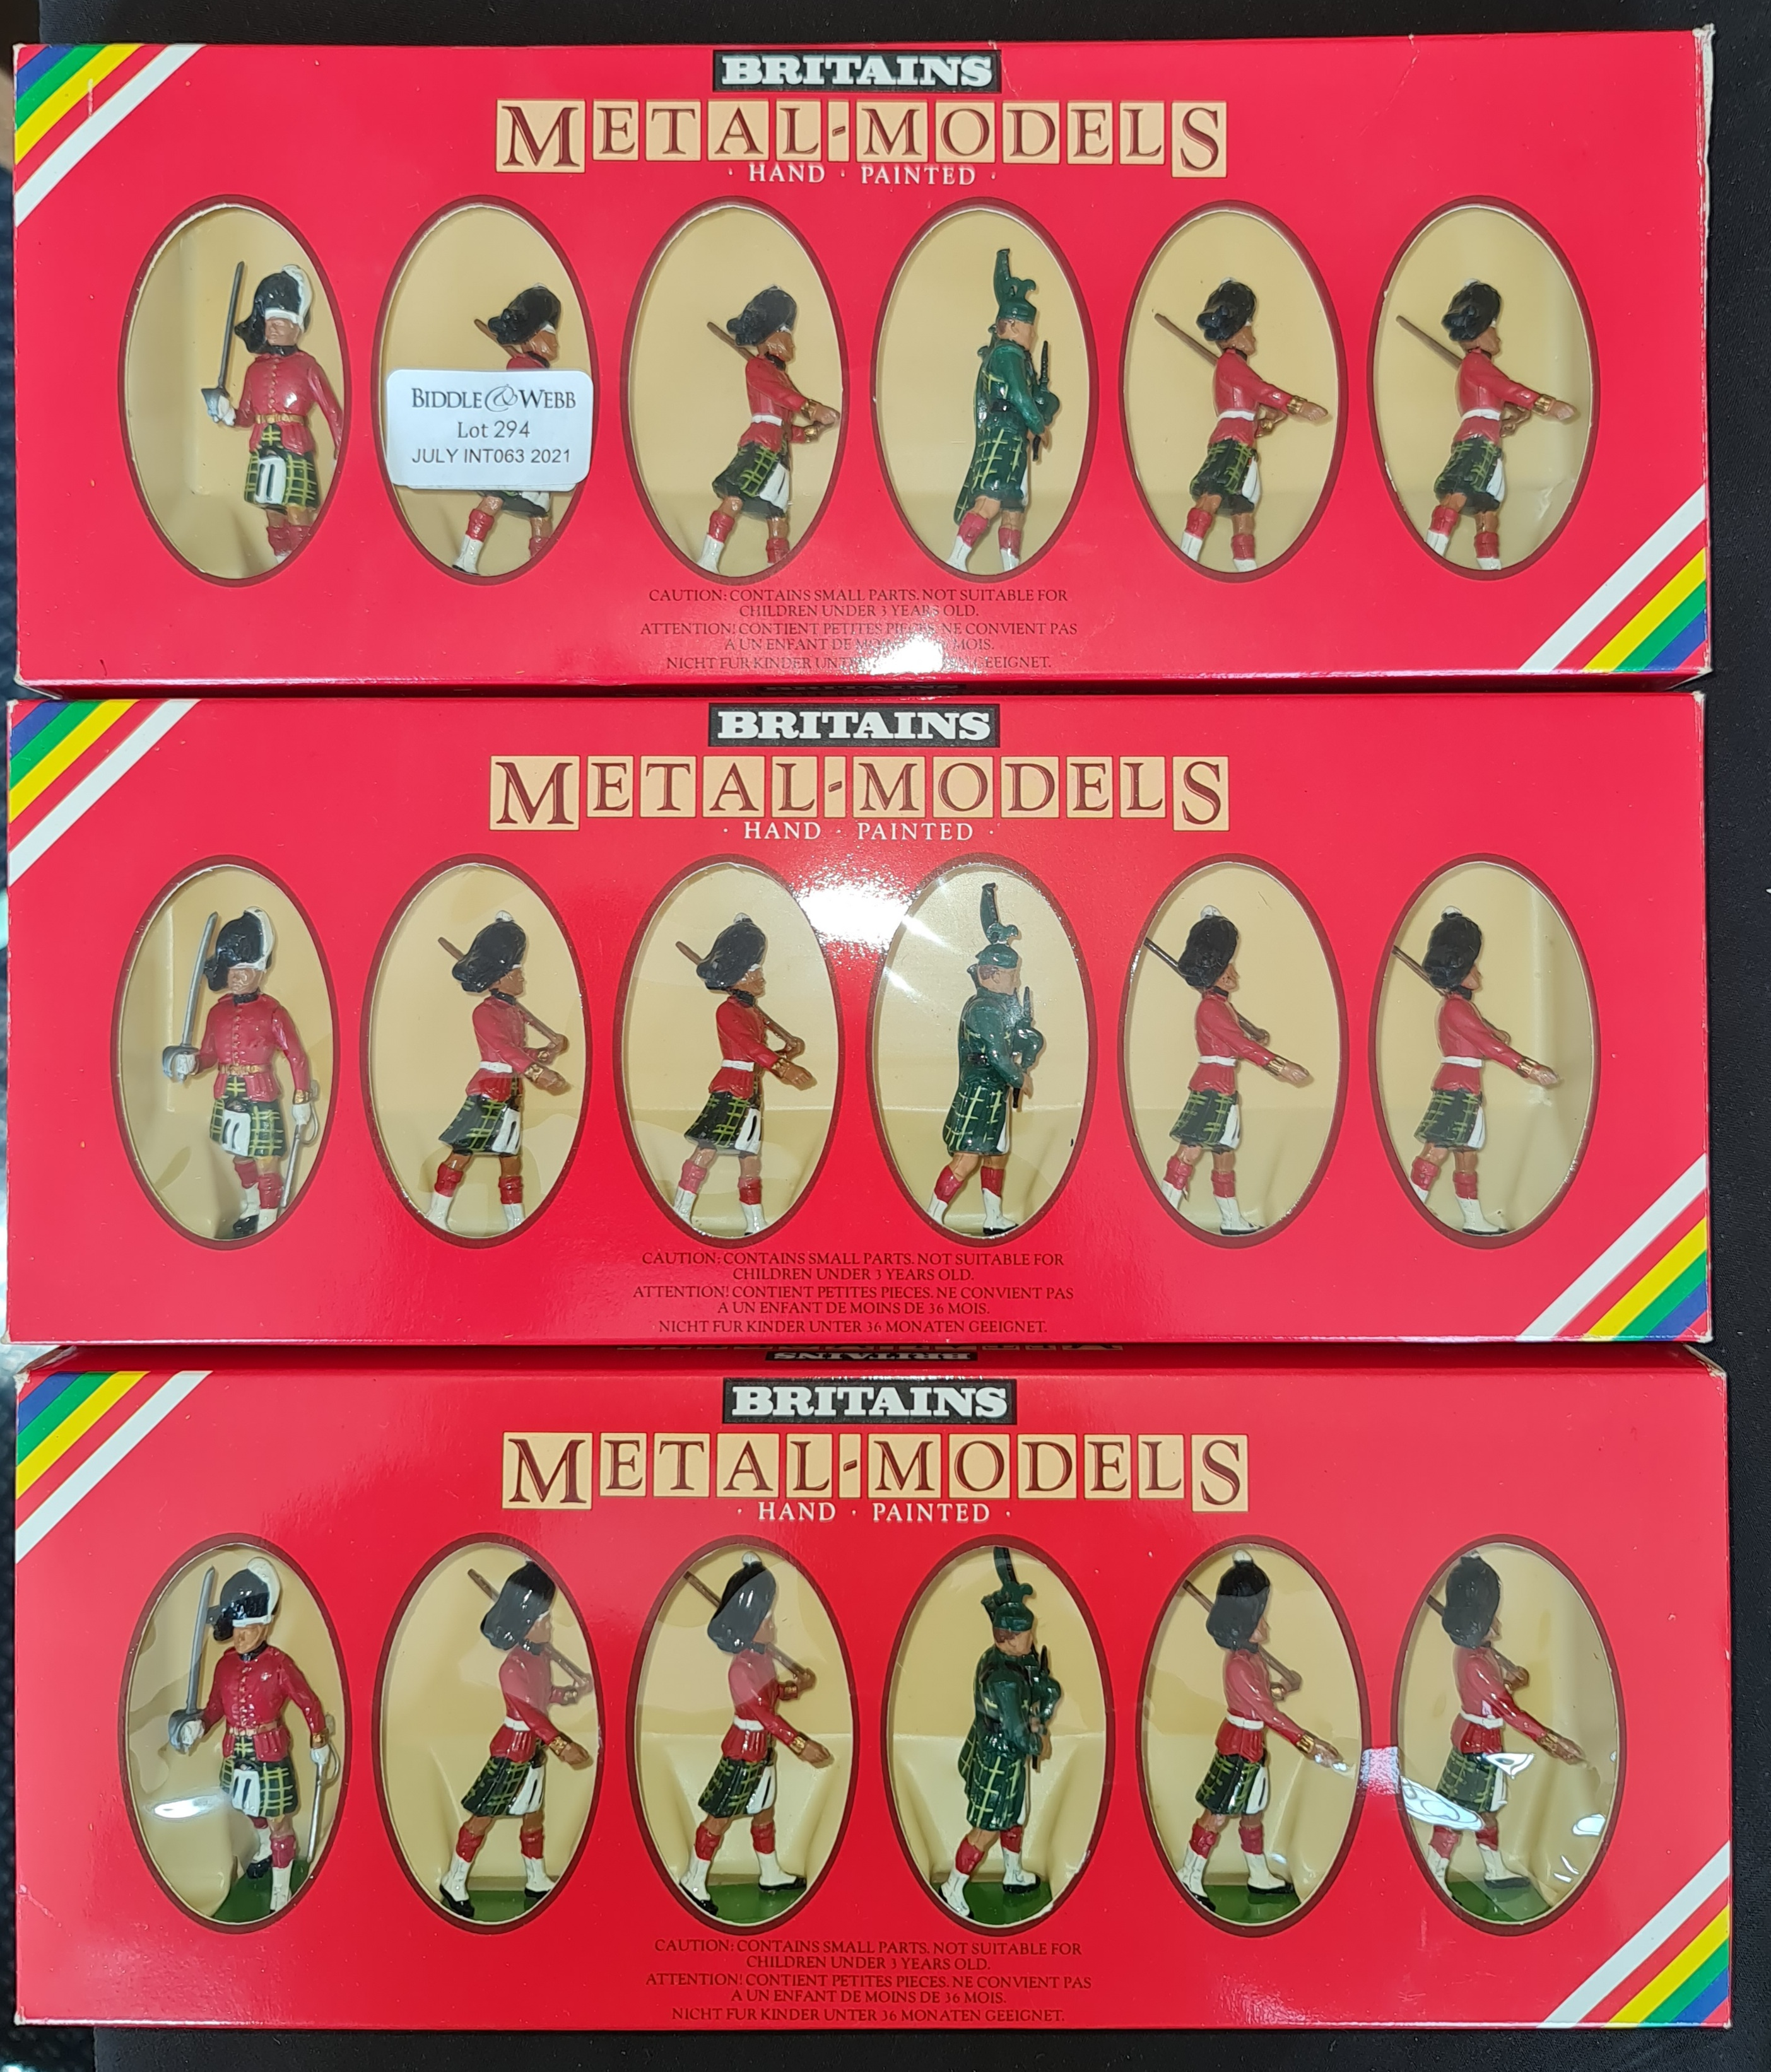 Three box sets of Britain's handpainted metal-models, eighteen figures in total. IMPORTANT: Online